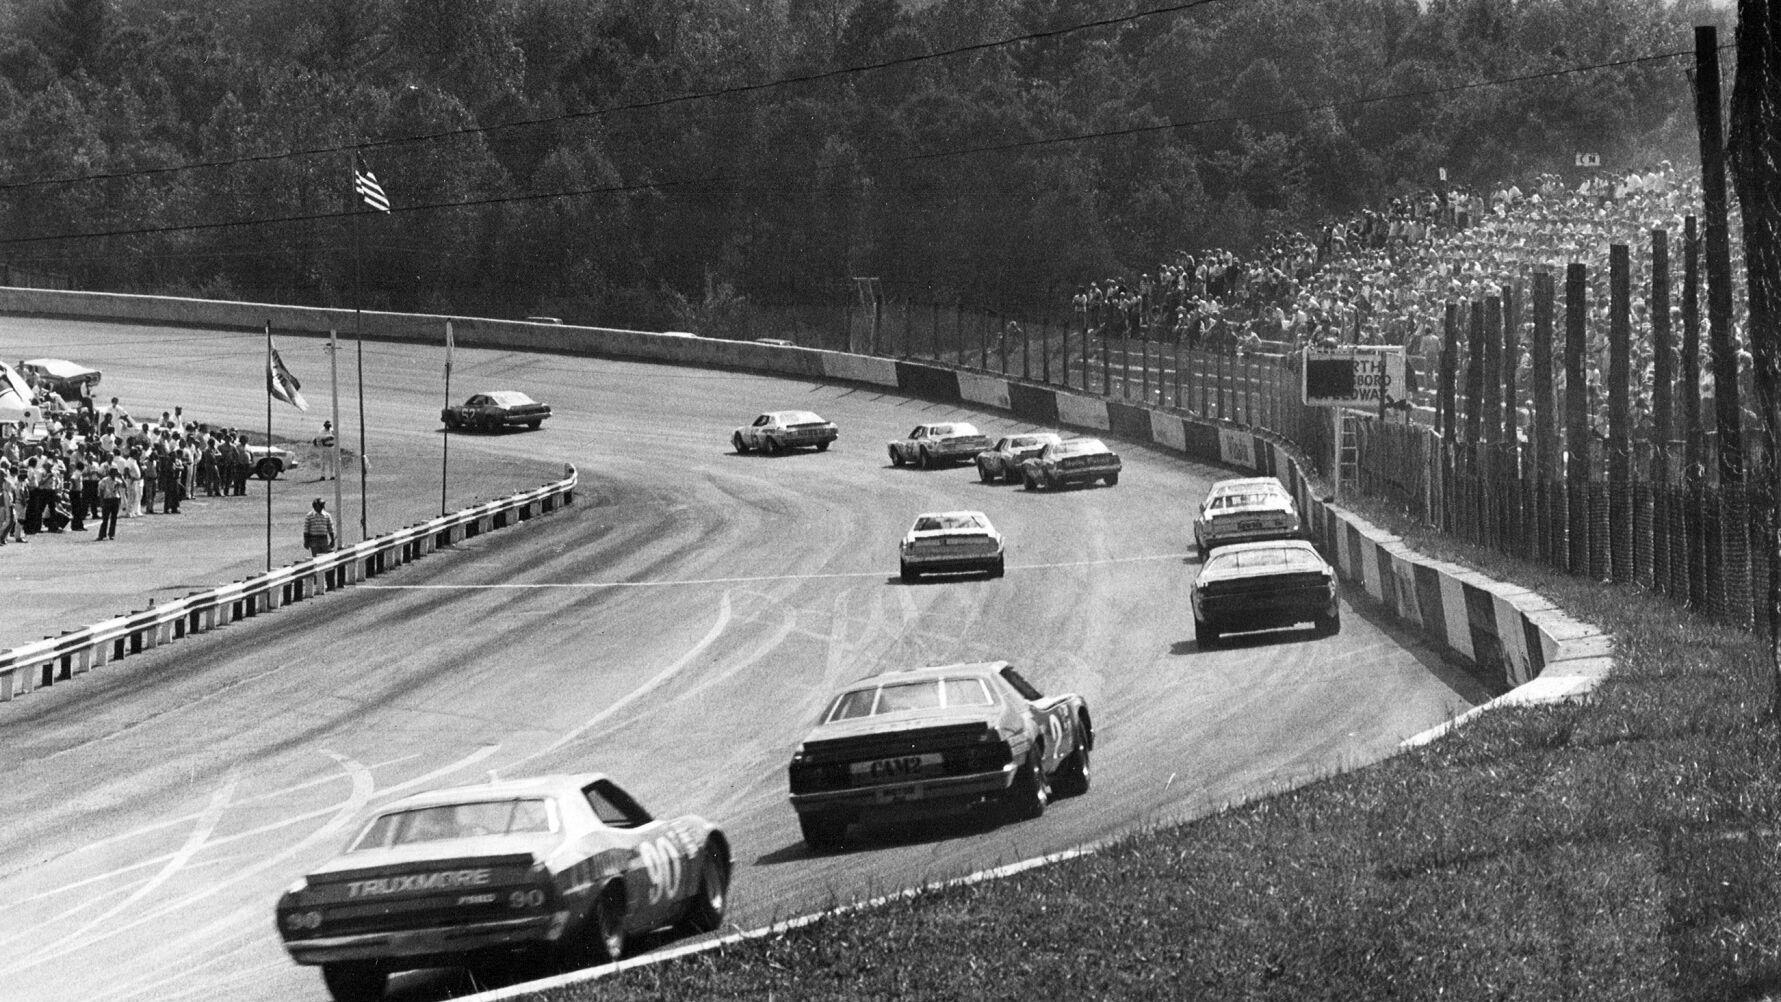 COLUMN: North Wilkesboro Speedway, 25 years later